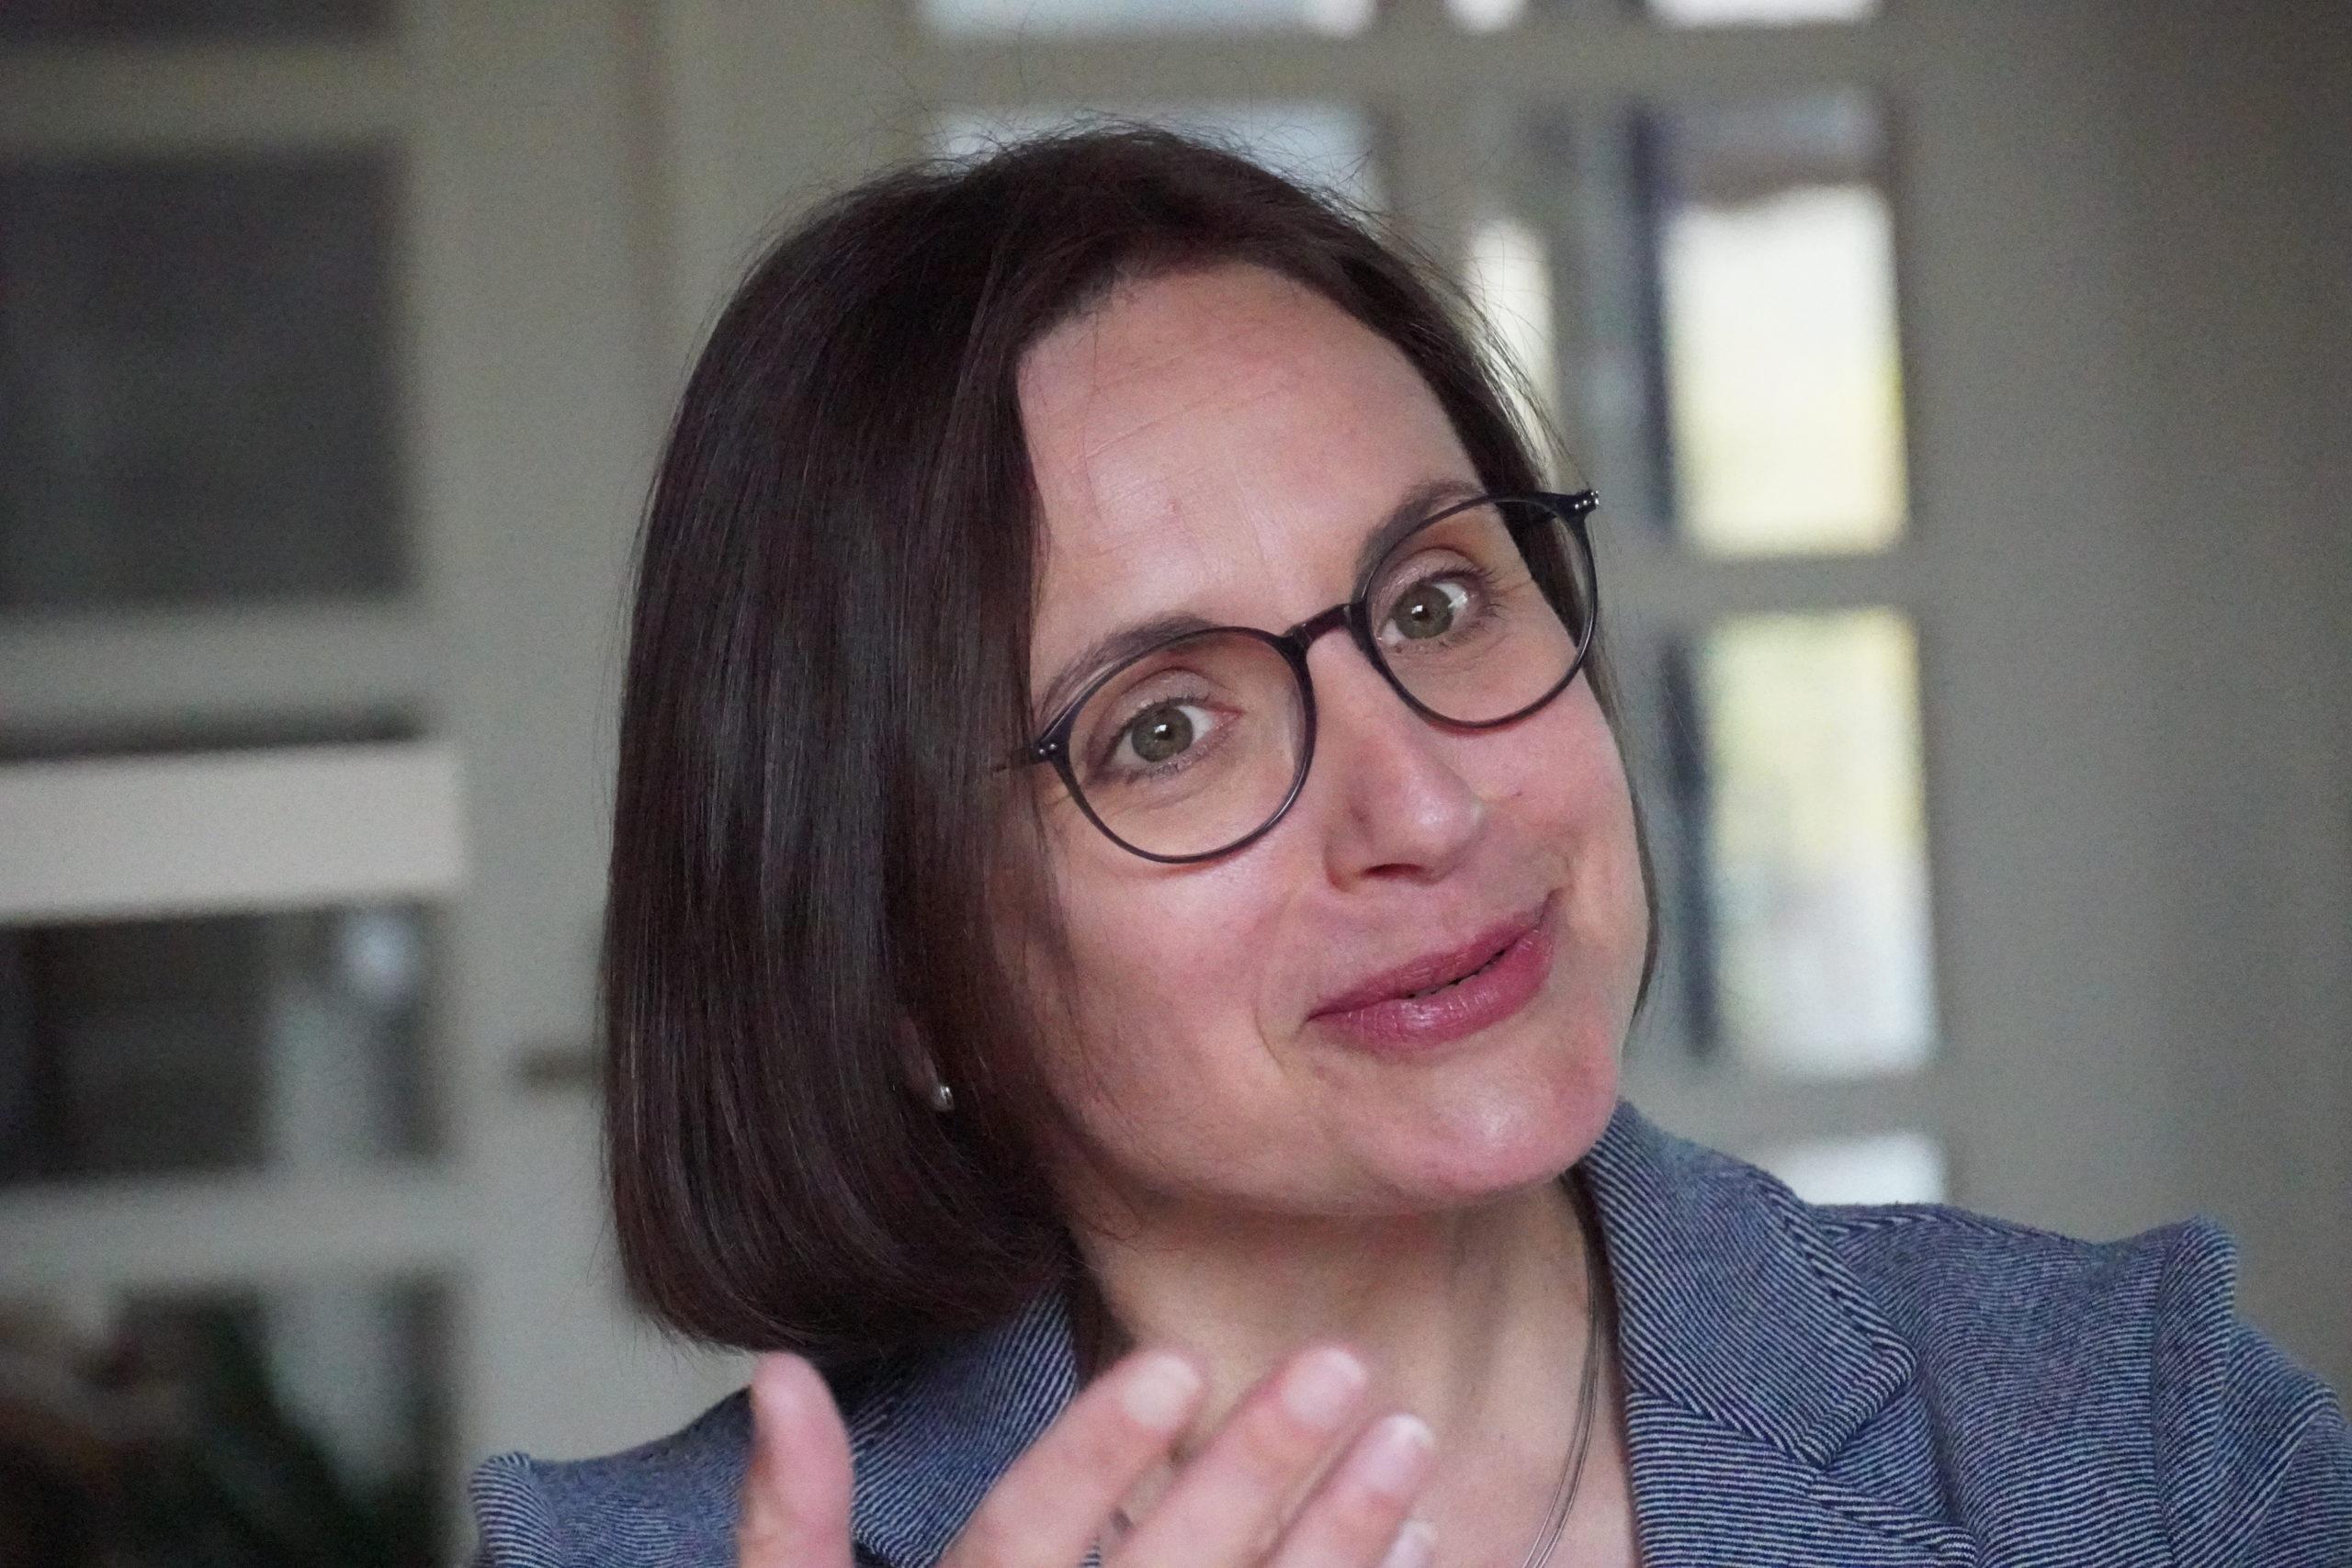 Silvia Möller